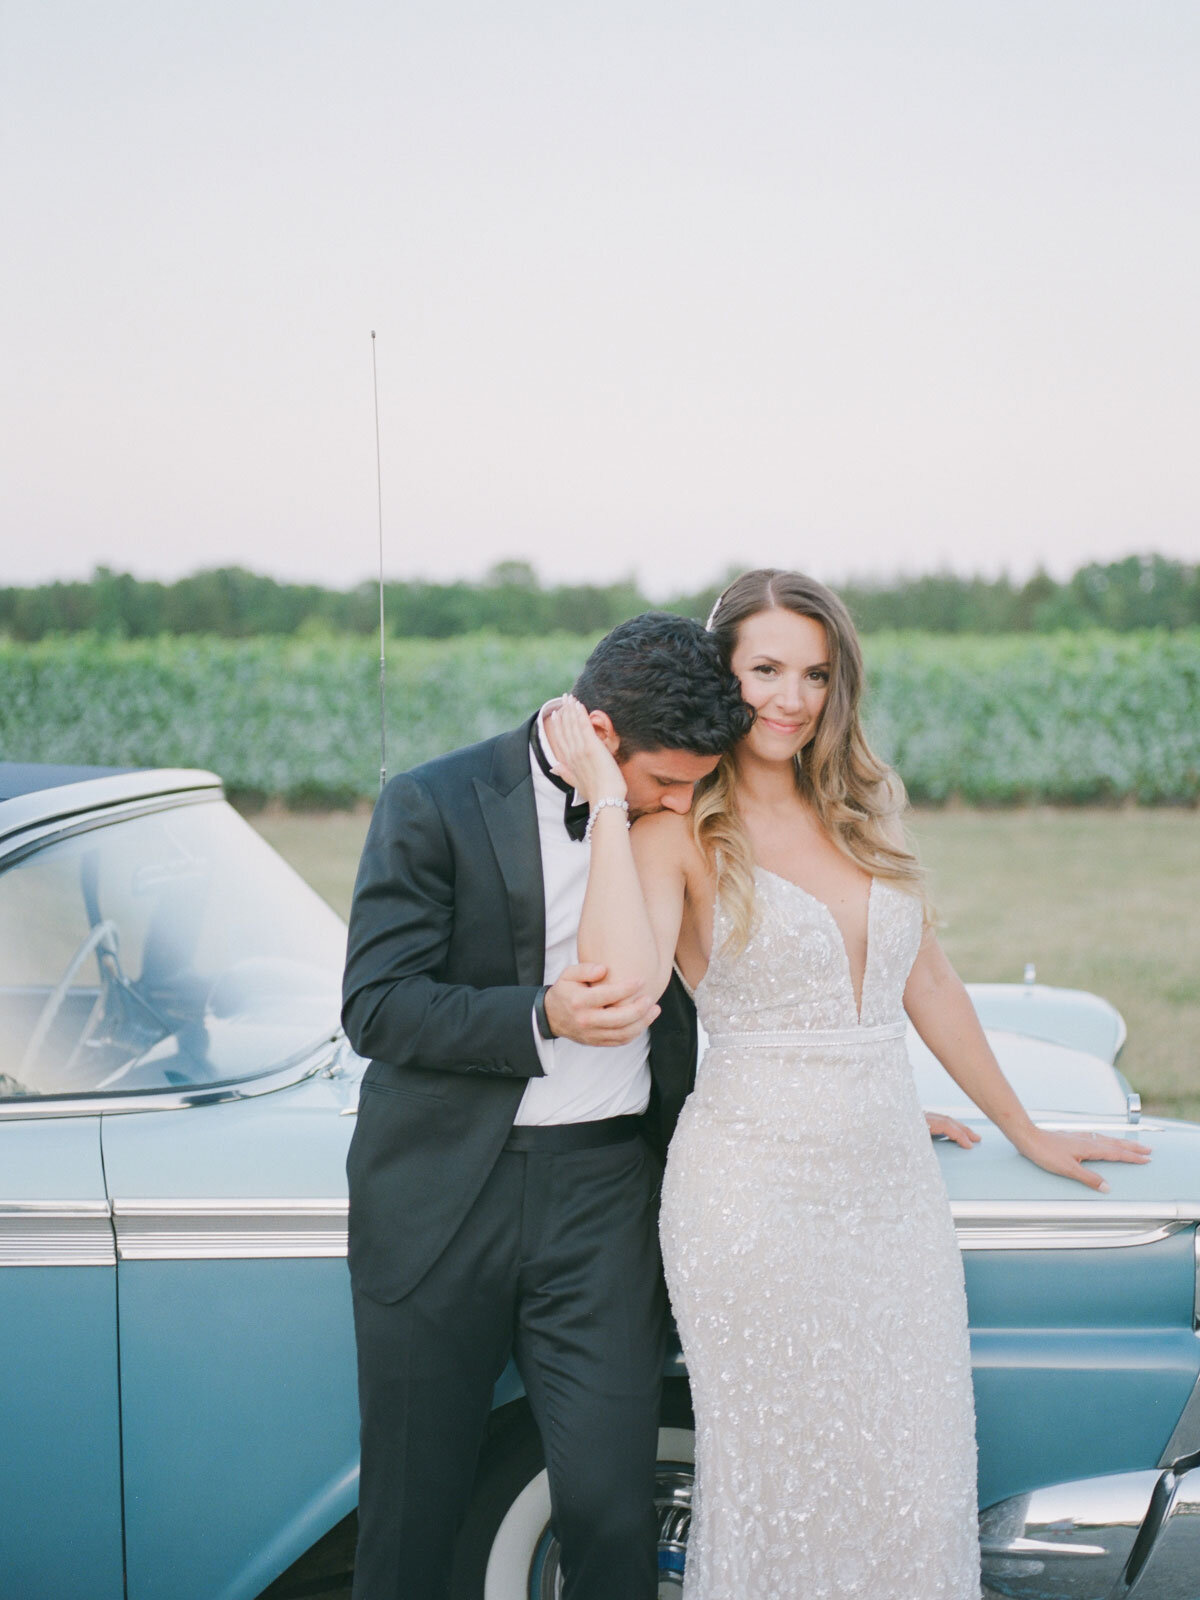 Chateau-des-Charmes-Wedding-Summer-Vineyard-Bride-Niagara-on-the-Lake-photos-by-Gemini-Photography-Ontario-0079.jpg